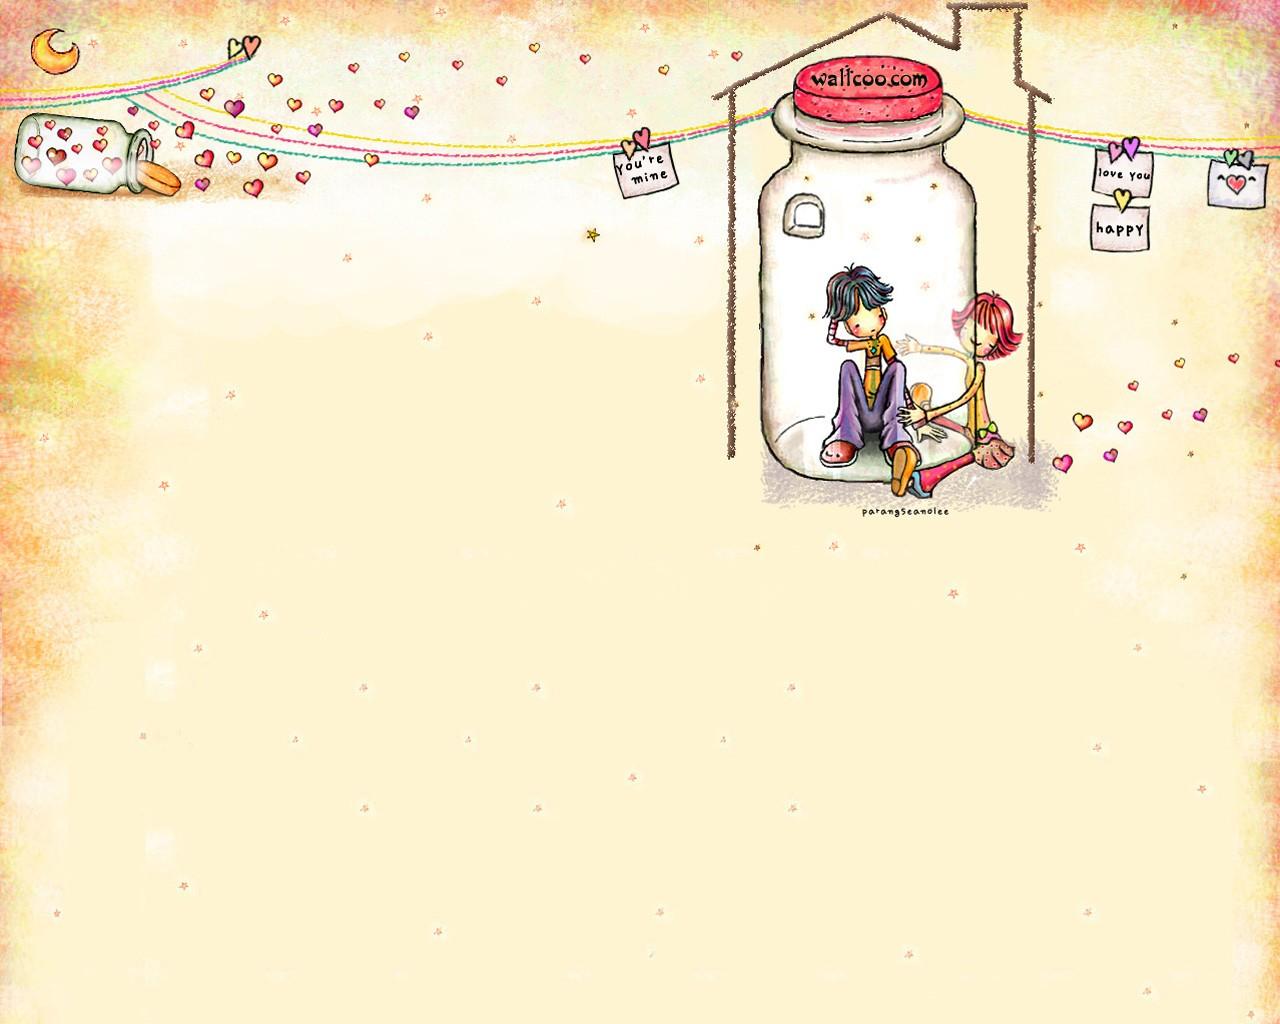 http://1.bp.blogspot.com/-kqla3SVOFd4/T6e-BWh49BI/AAAAAAAAAno/K3vm30Wd8QM/s1600/cartoon-wallpapper-wallcoo-illustration-illust-p-trng-wallpapers_for_desktop.jpg